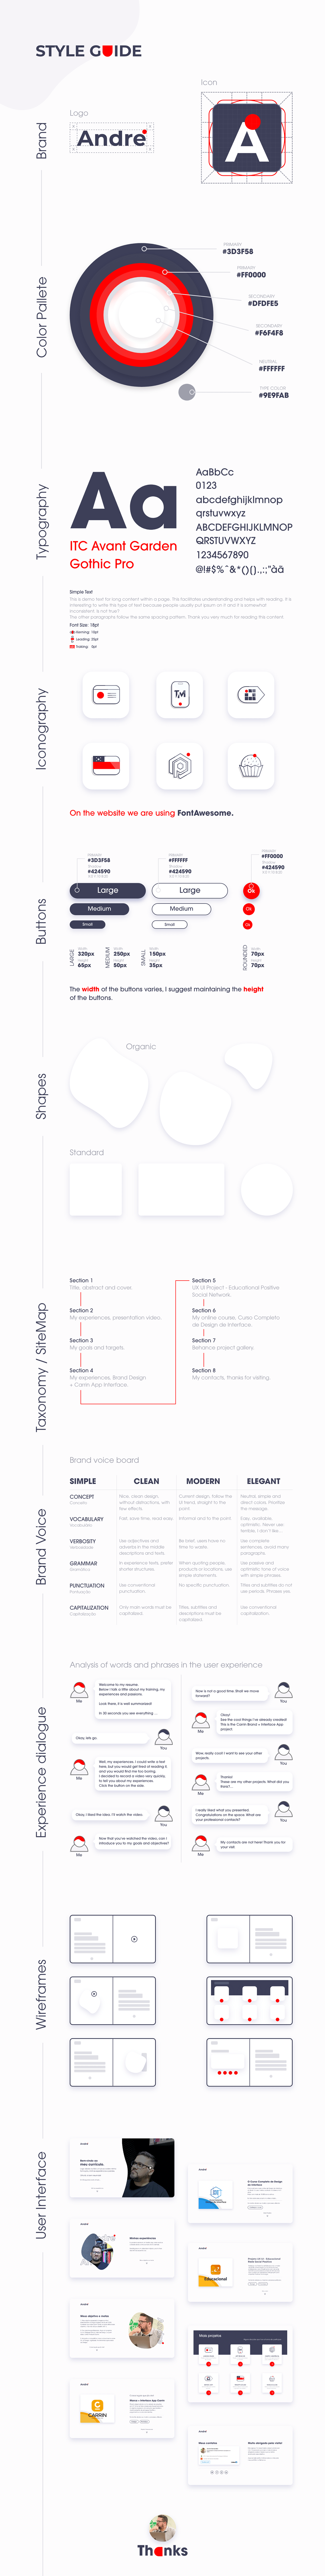 Projeto UI UX deste site aqui!